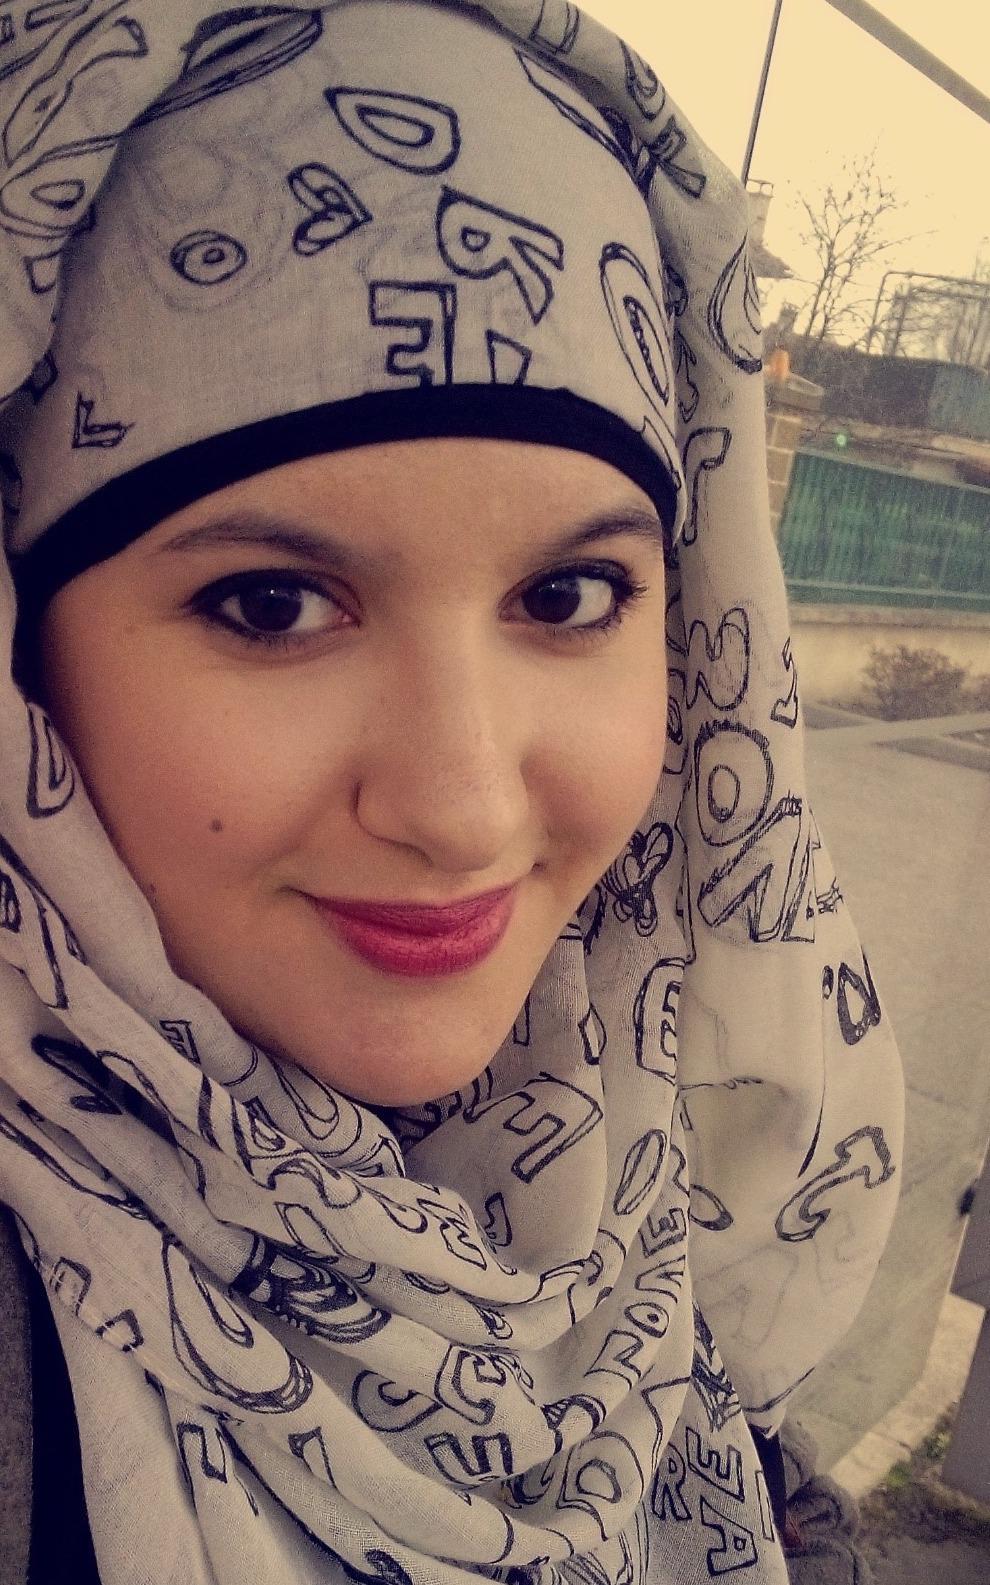 cv web de mariyam hamdaoui